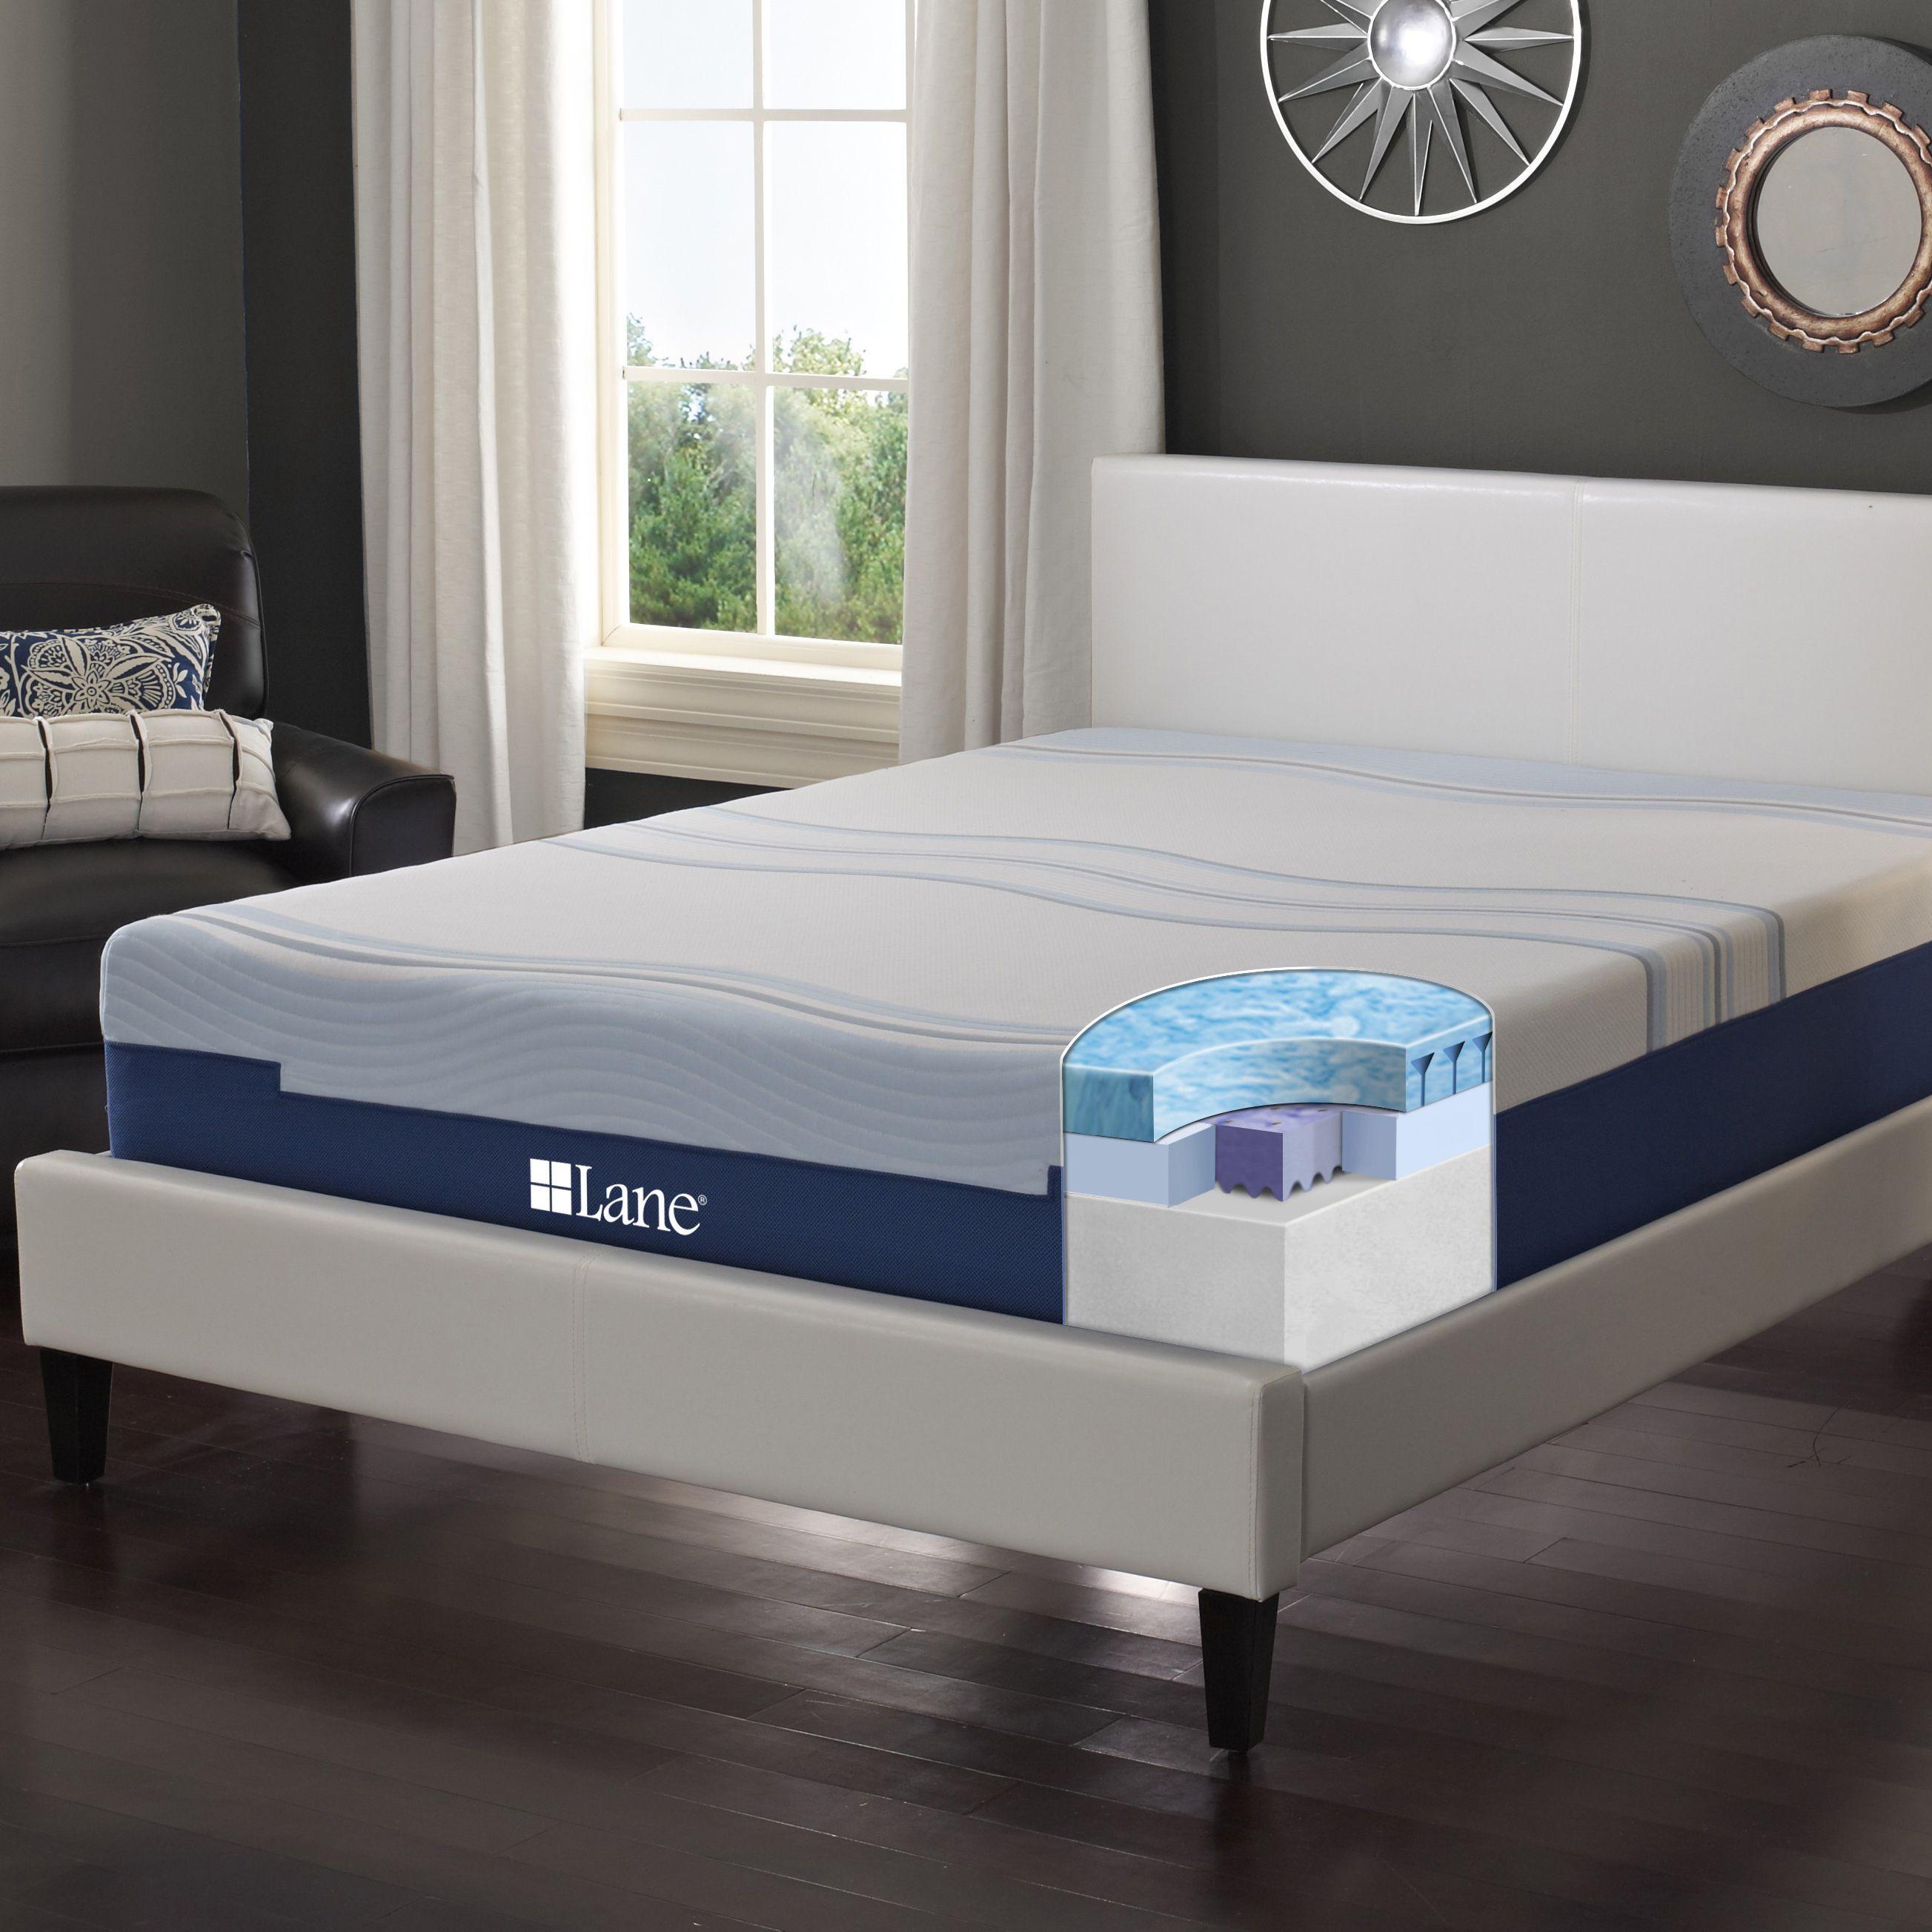 Signature Sleep Memoir 6 inch Mattress, Size King in 2019